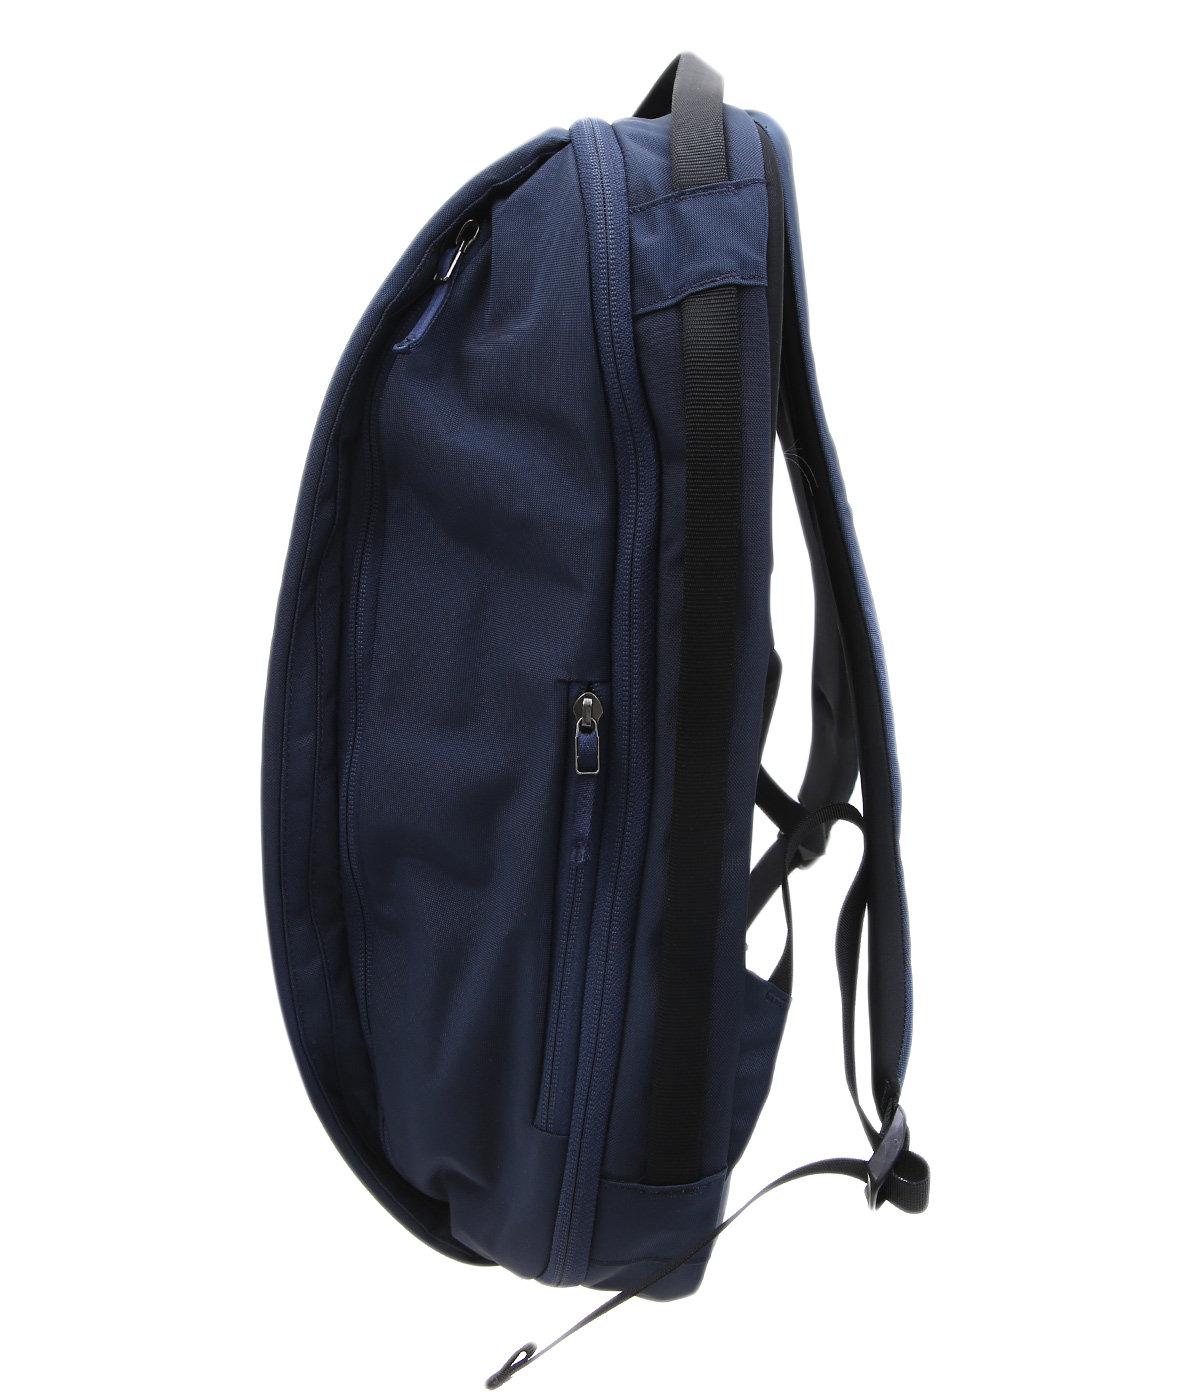 Blade 20 Backpack -Cobalt Moon-